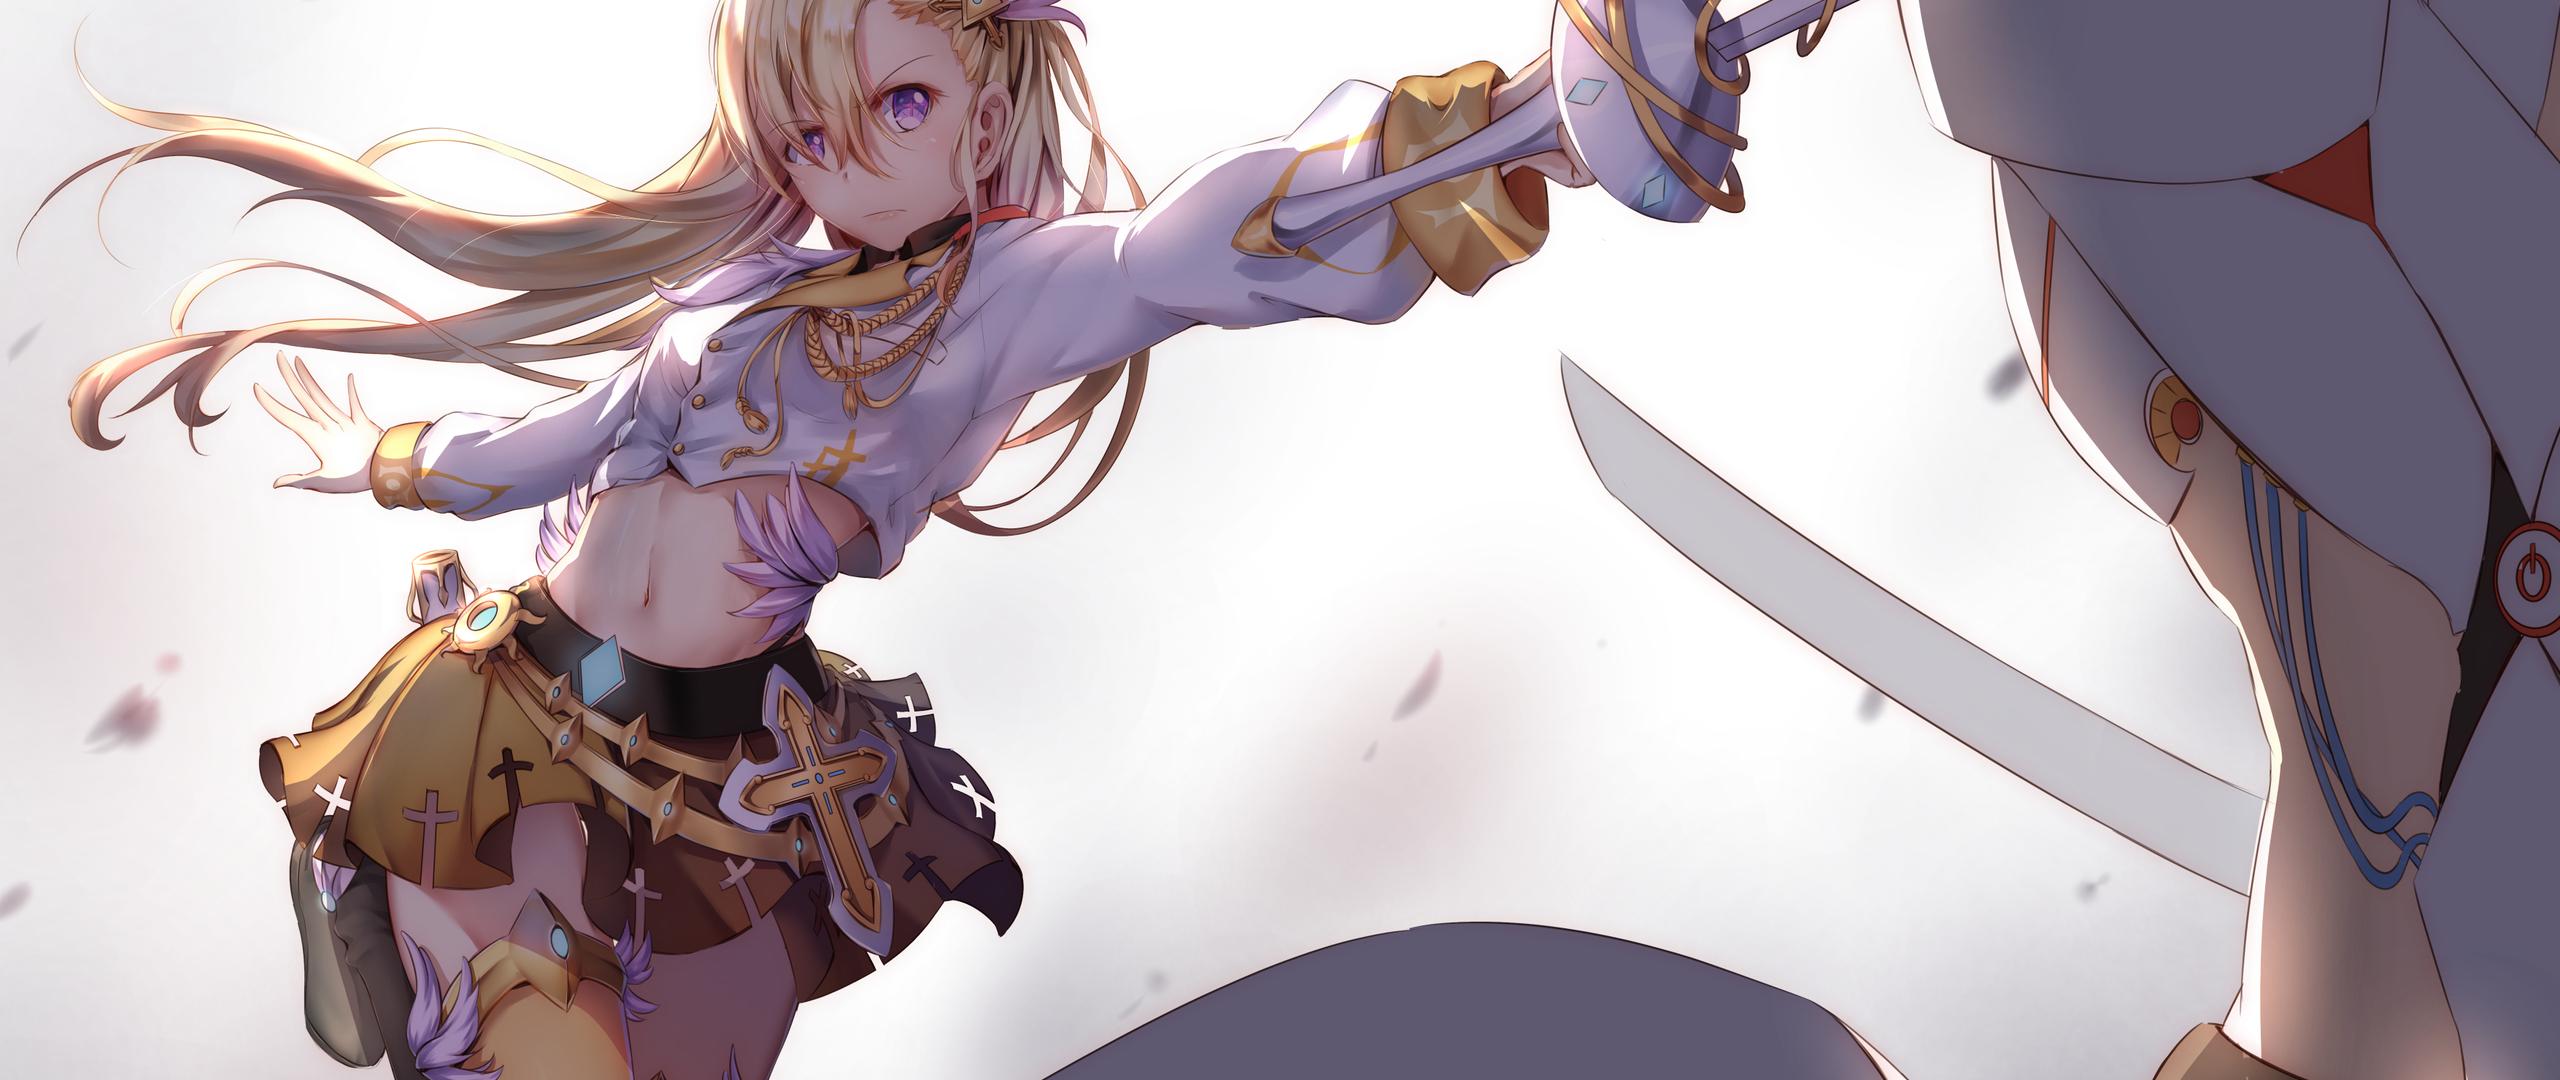 2560x1080 Anime Girl Sword Long Hair 4k 2560x1080 ...